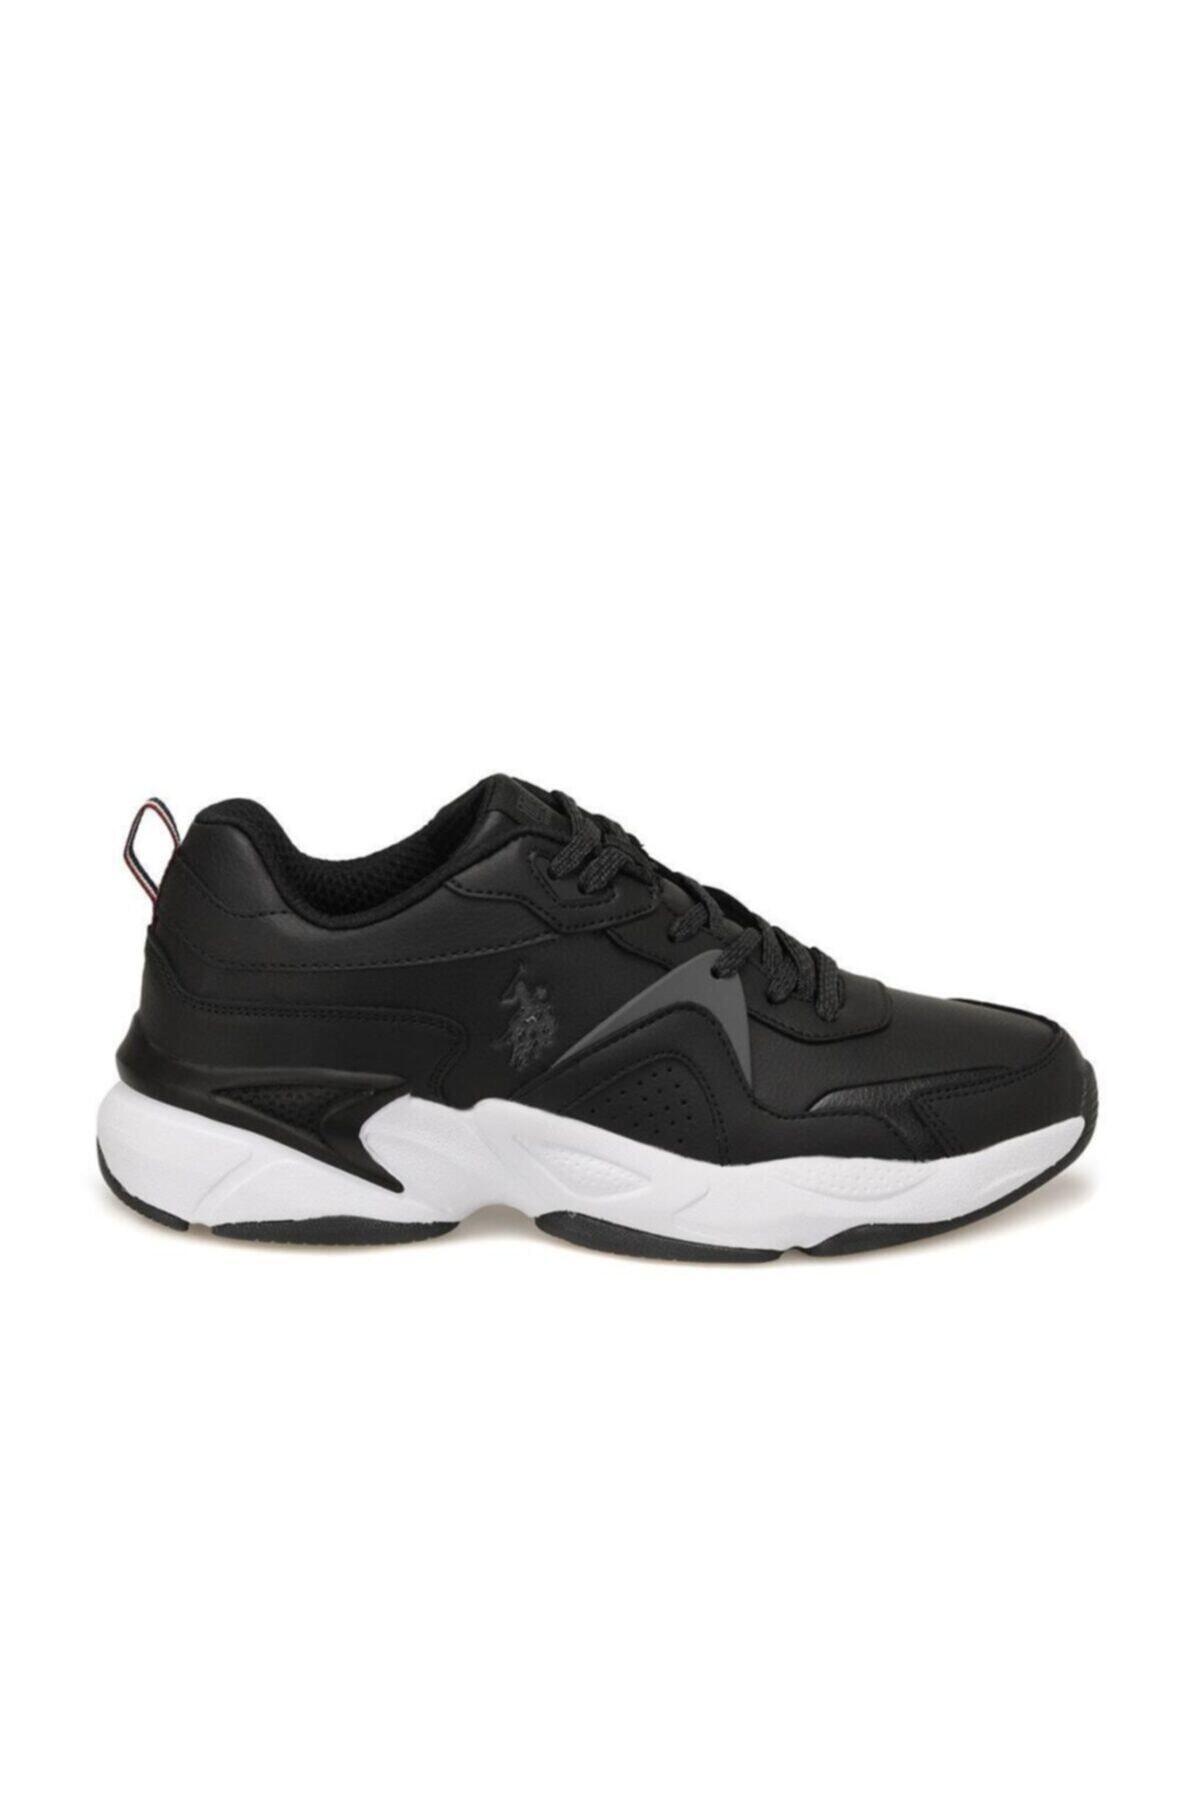 U.S. Polo Assn. Erkek Siyah Sneaker Ayakkabı 1